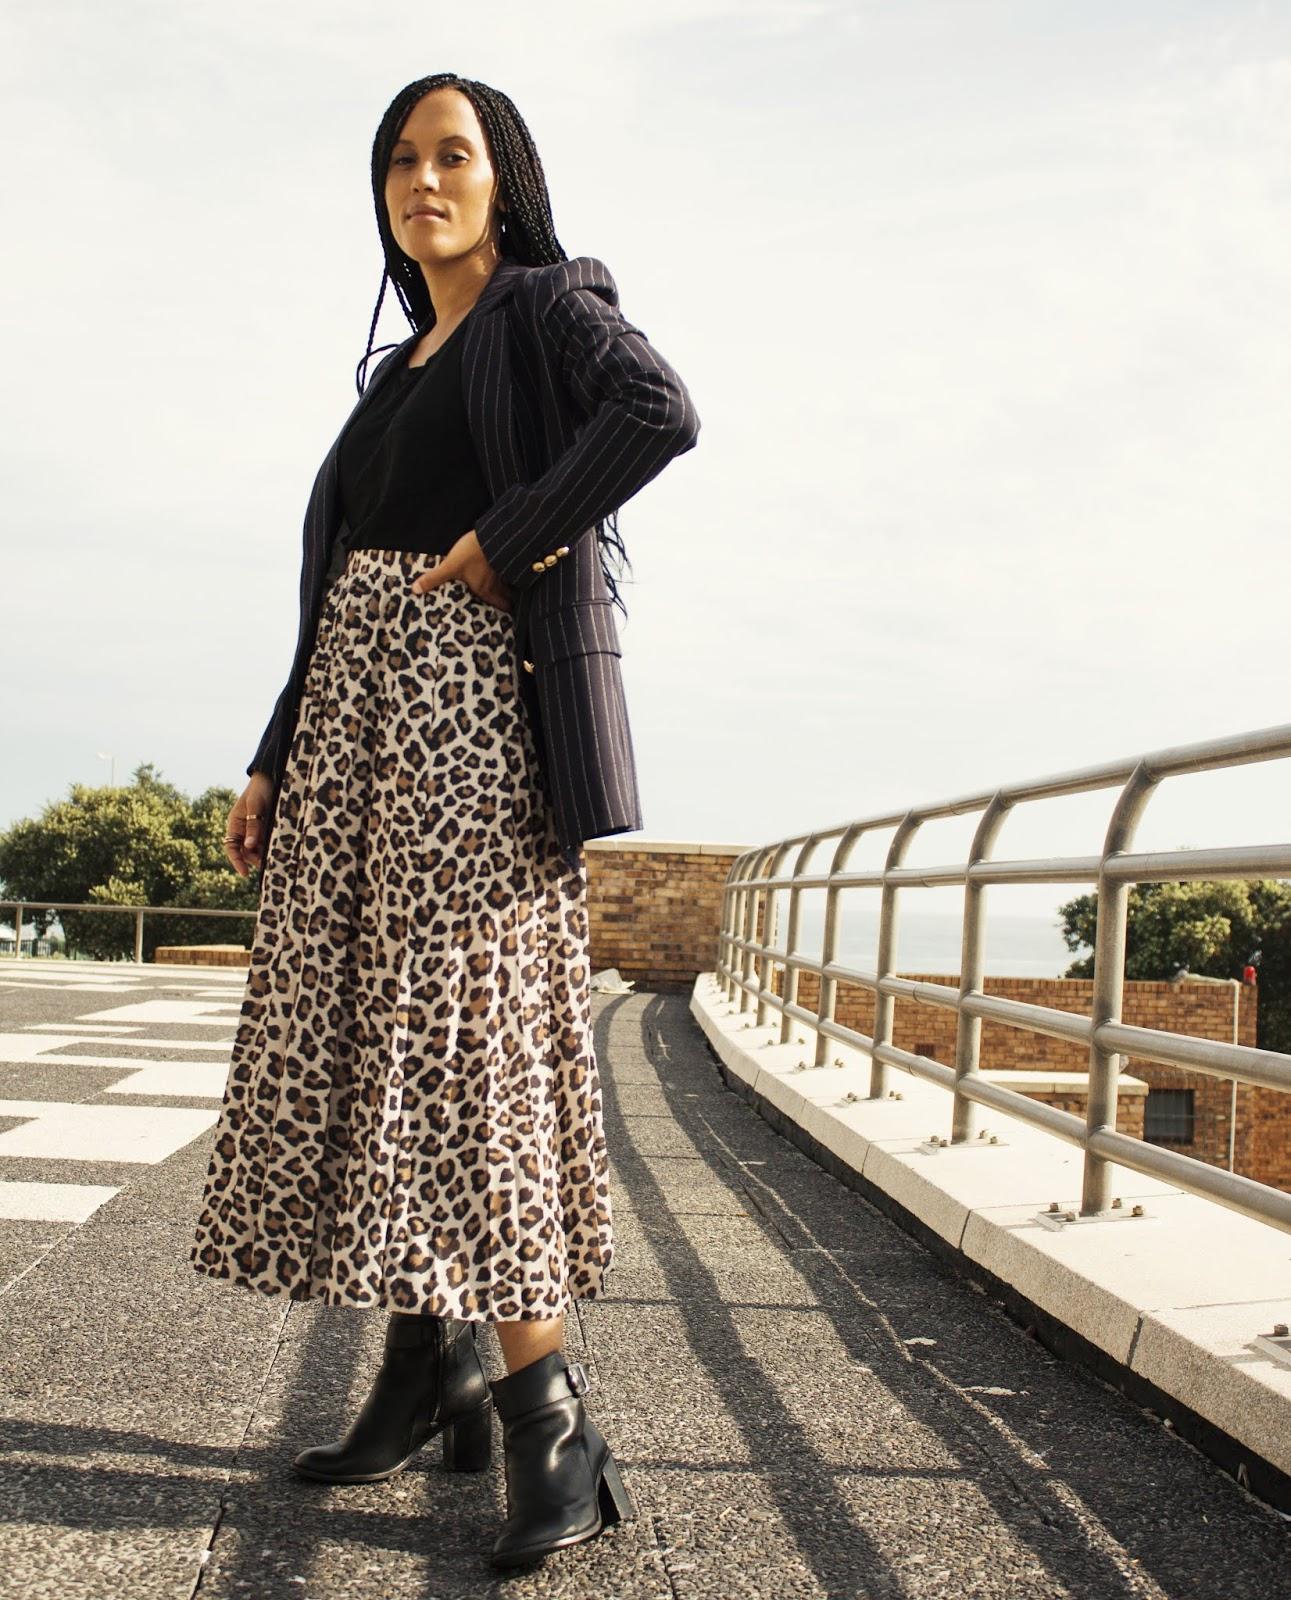 Liezel-Esquire-how-to-wear-leopard-print